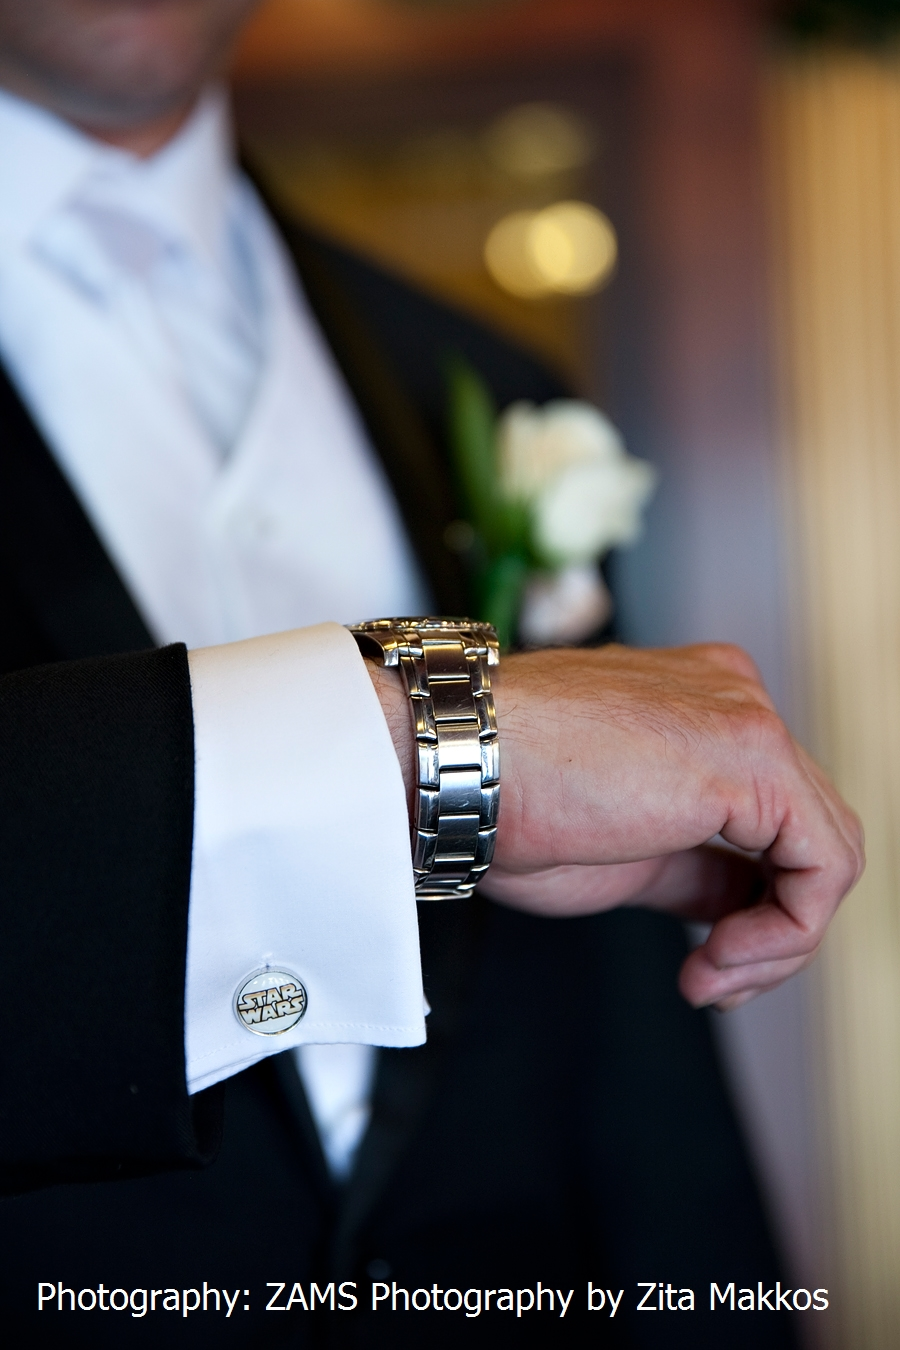 daryl_dixon_cuff_links_men_wedding_groomsmen_groom_cufflinks_2.jpg